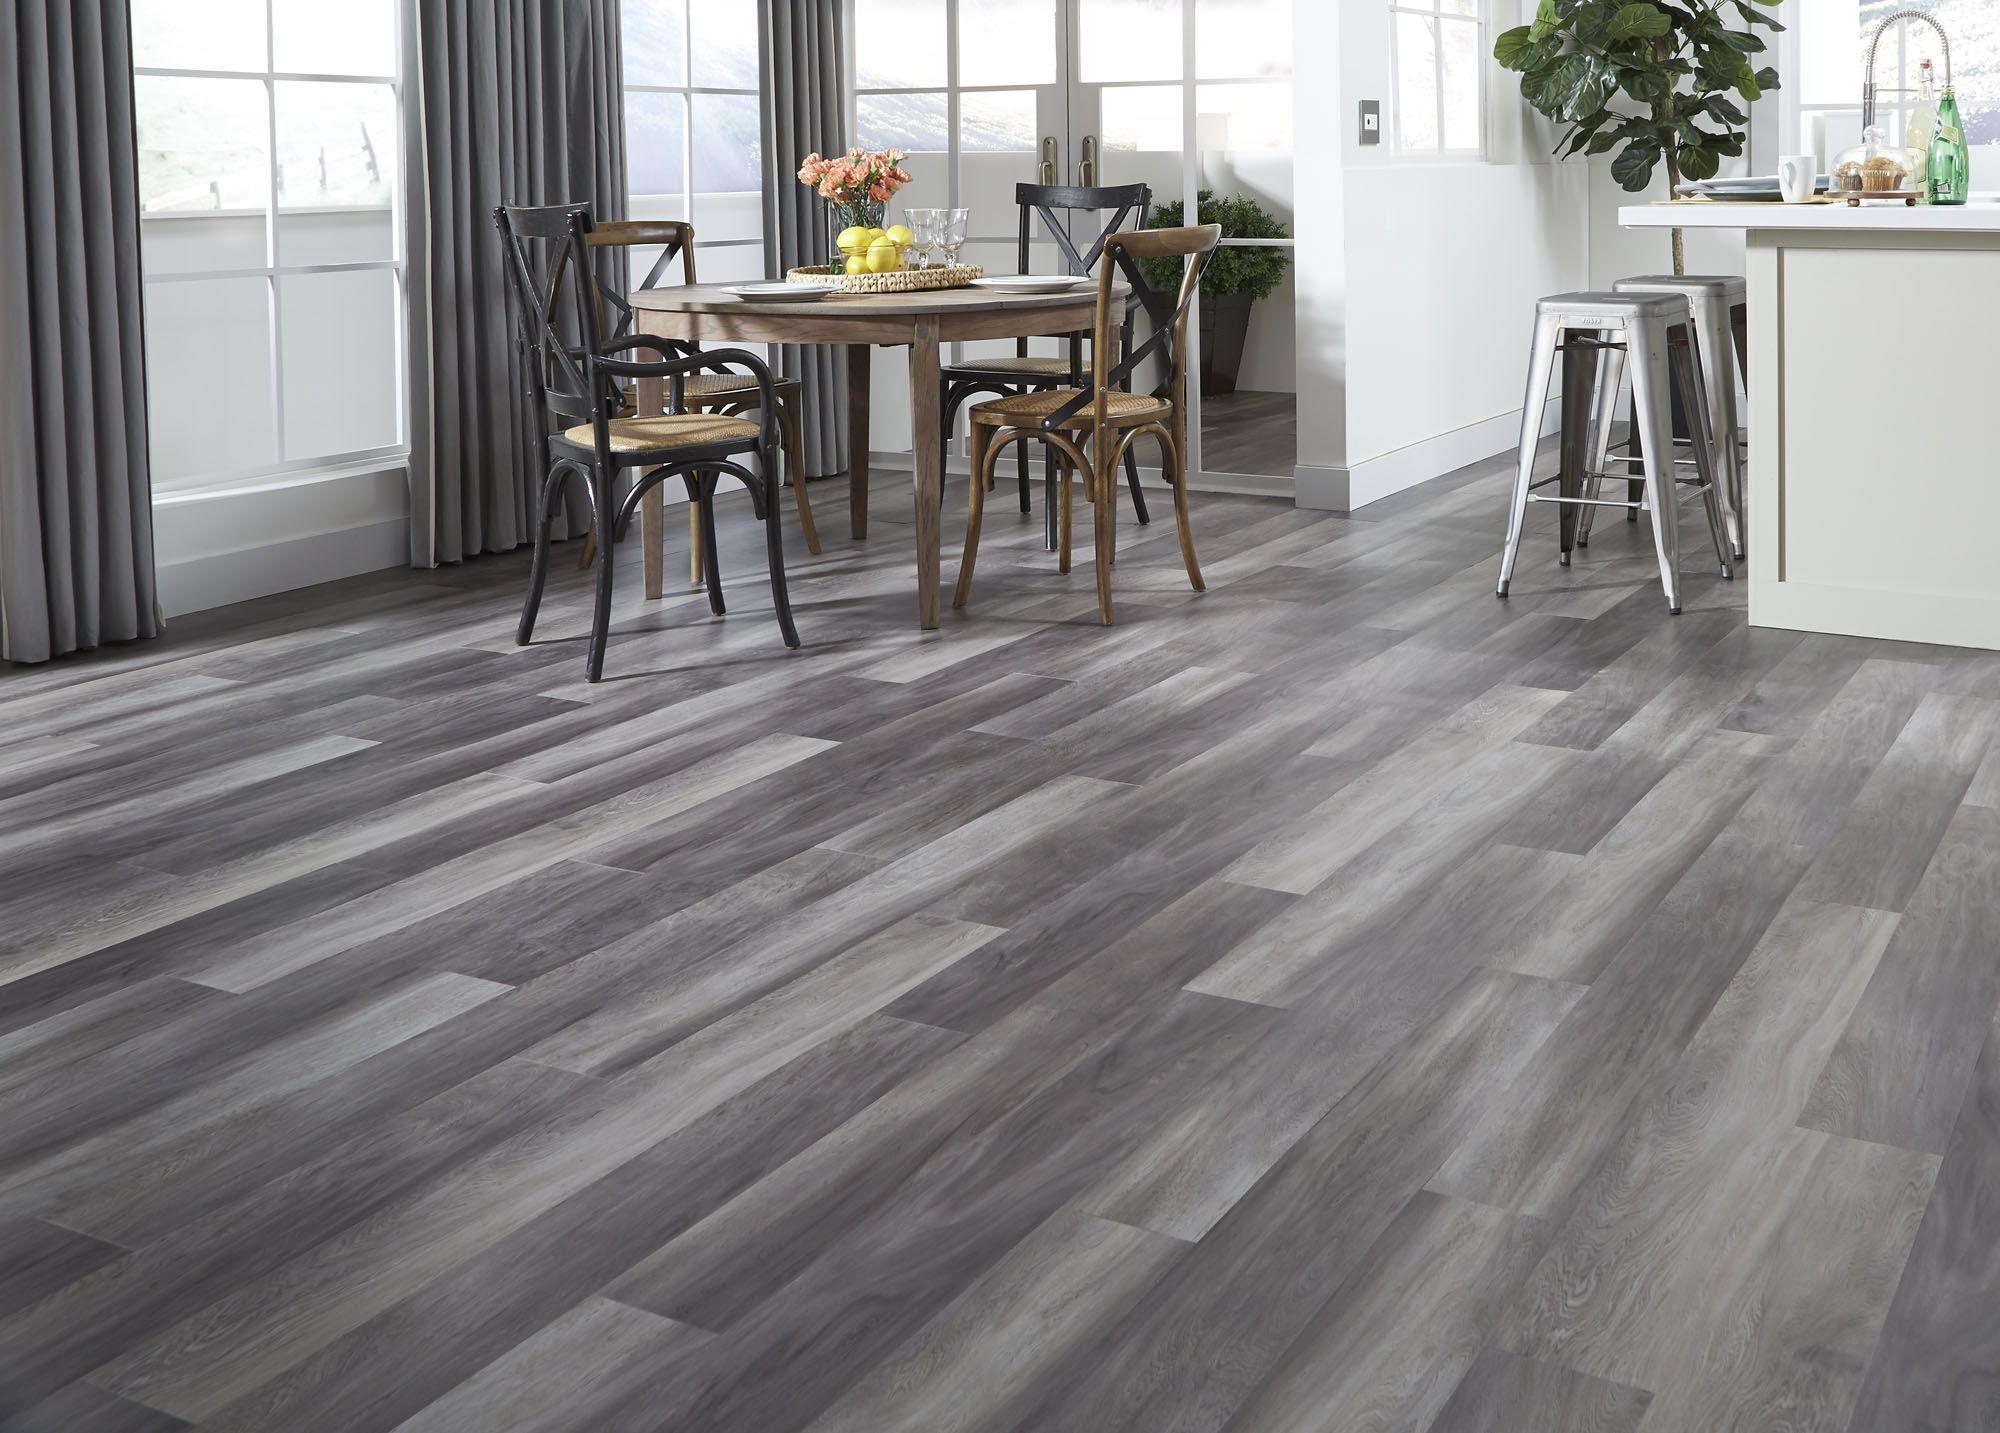 Eglinton Carpets Vinyl Flooring Toronto Resilient Floors Mississauga Tile Oakville Bamboo North York Floor Tiles Burlington